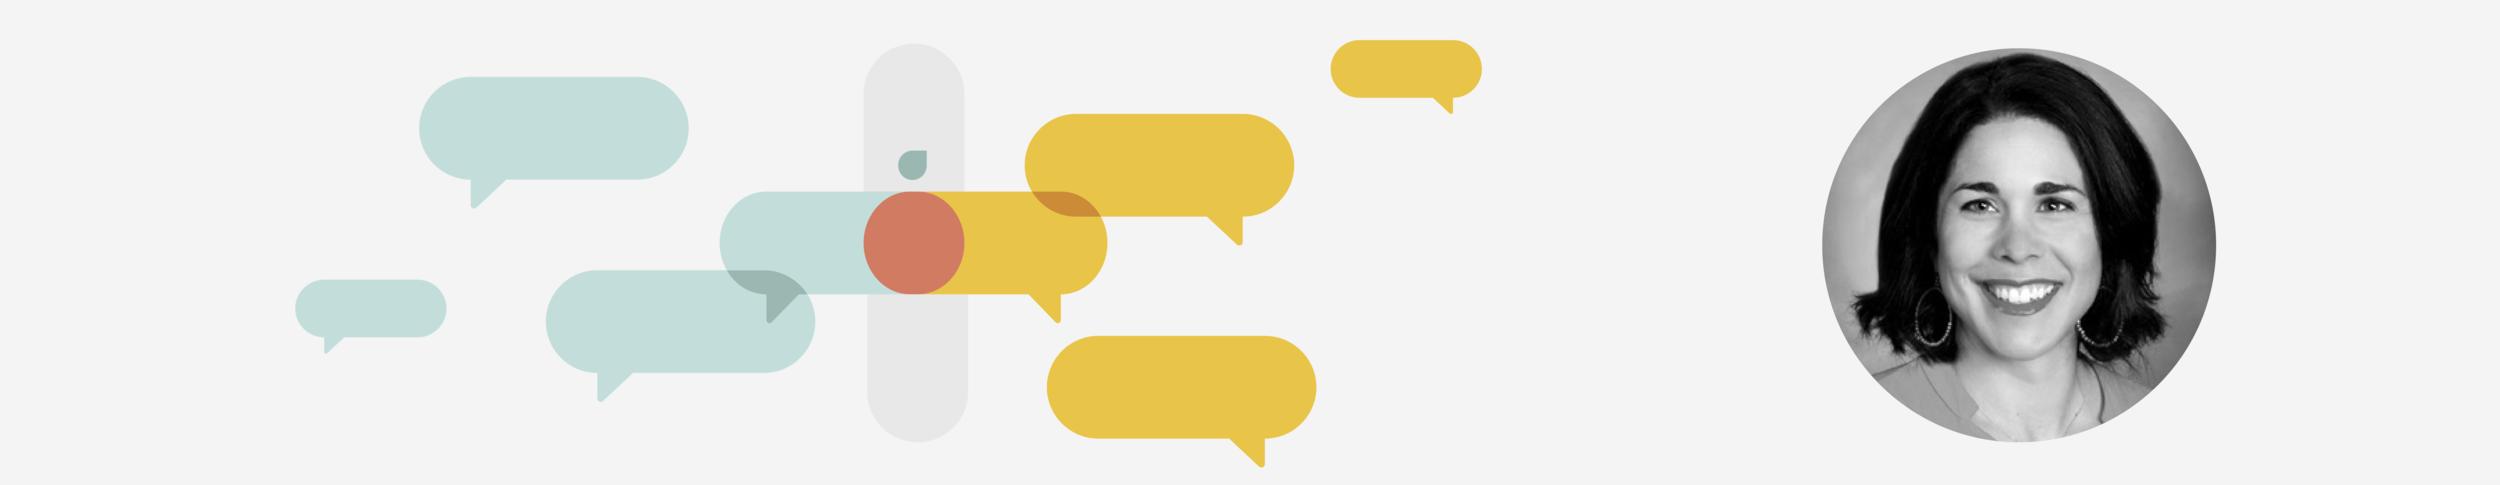 chat series header blog charmin-06.png